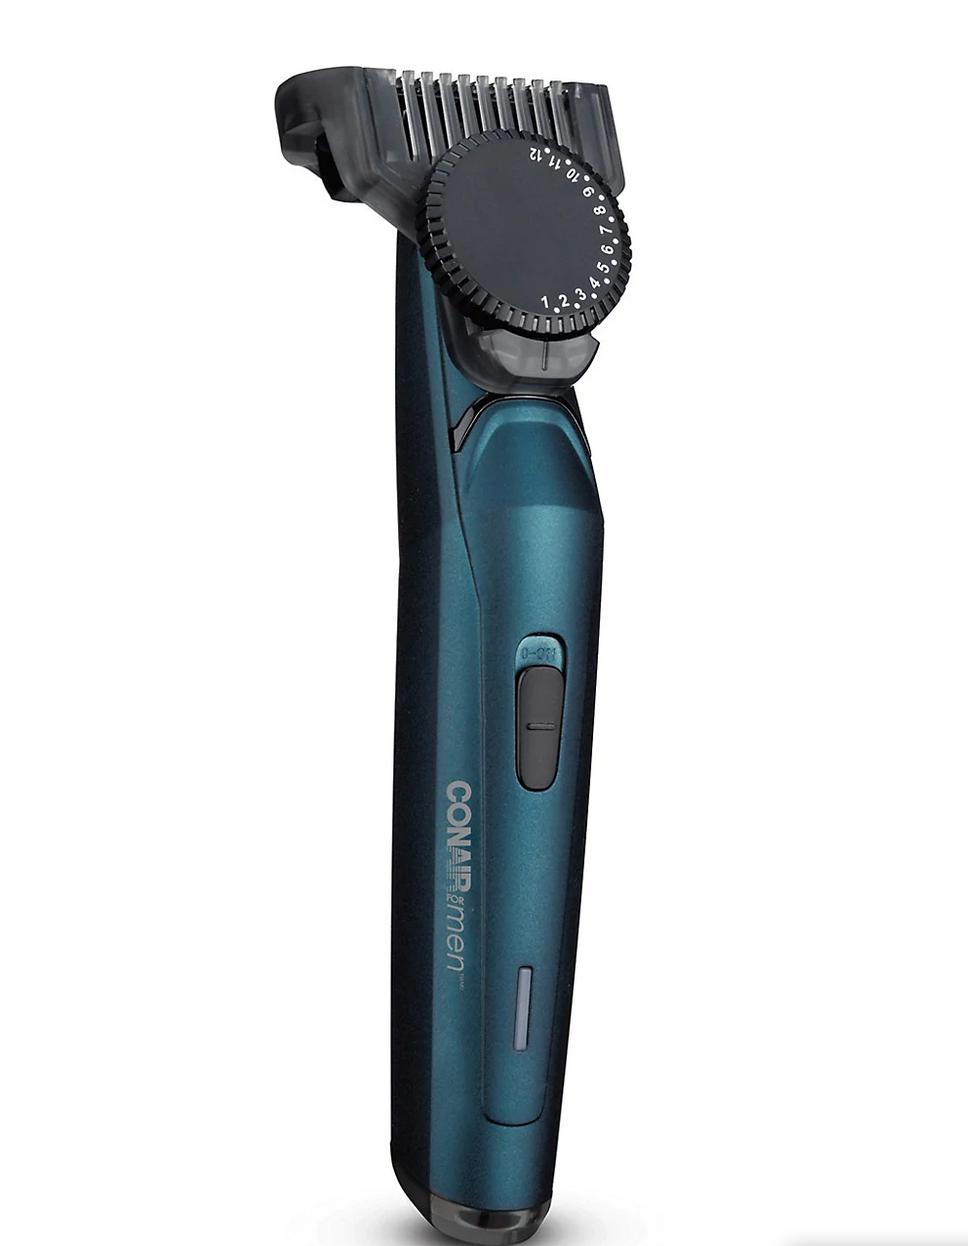 Conair Adjustable Beard Trimmer